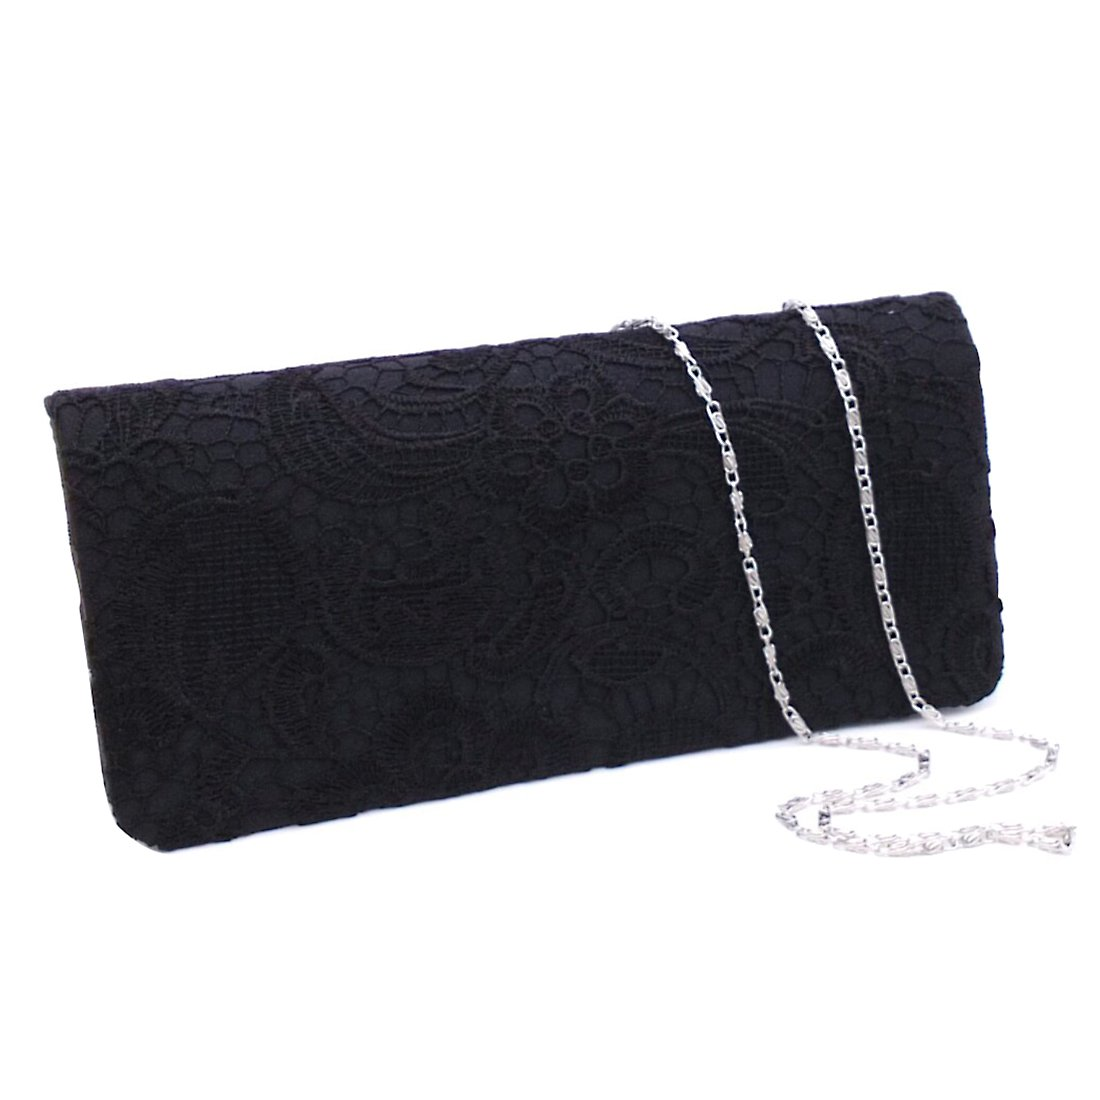 Silk Floral Flowers Clutch Evening Bag Elegant Purse Handbag for Cocktail Prom Wedding Party (Black)